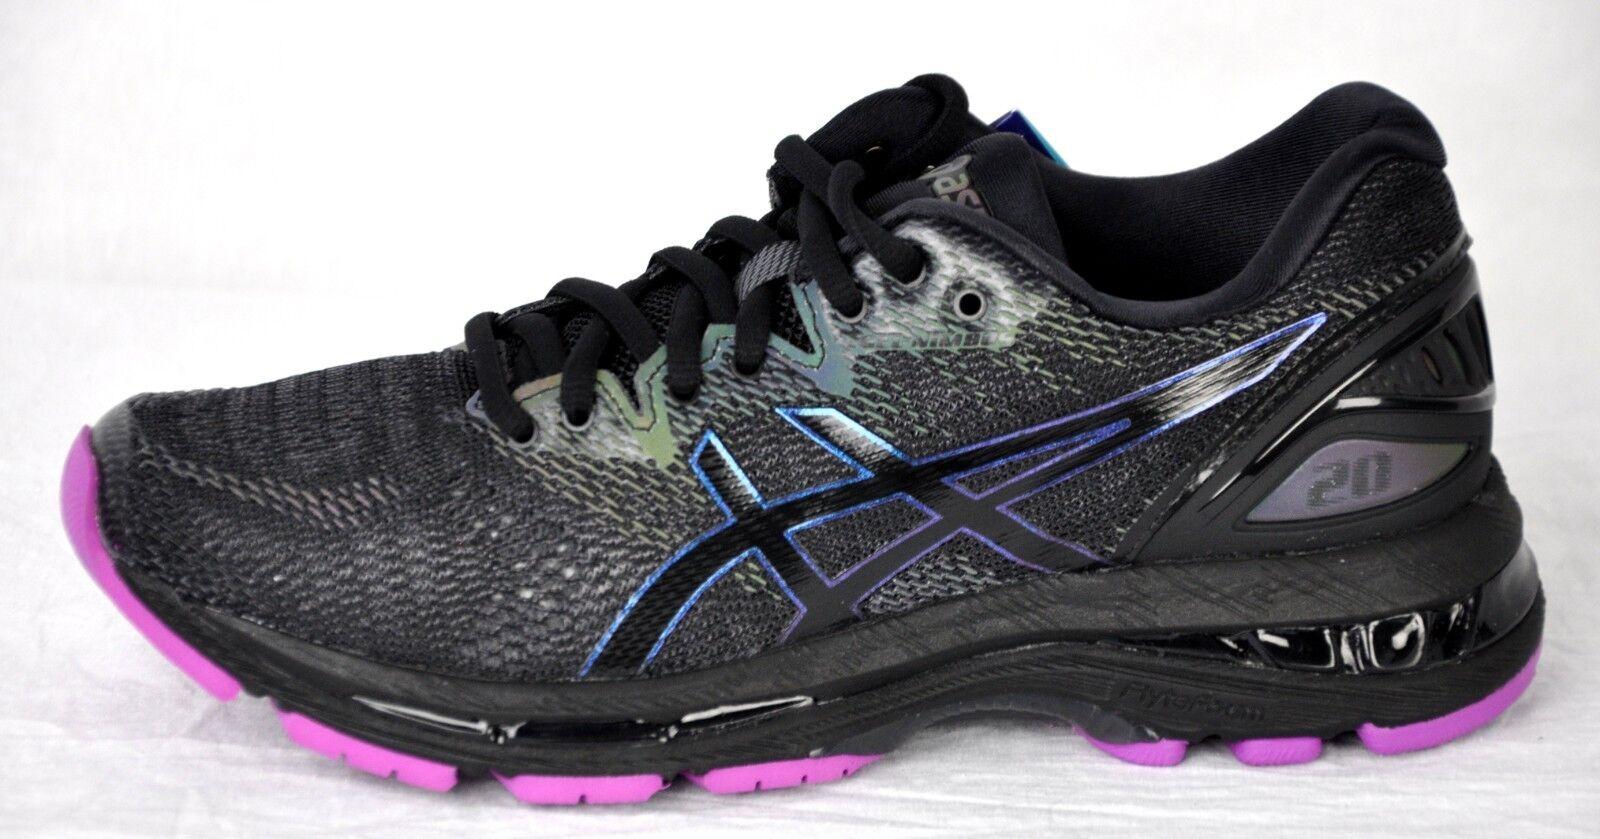 Asics Mens Gel Nimbus 20 Lite-Show Running shoes 1012A037 Black Size 8